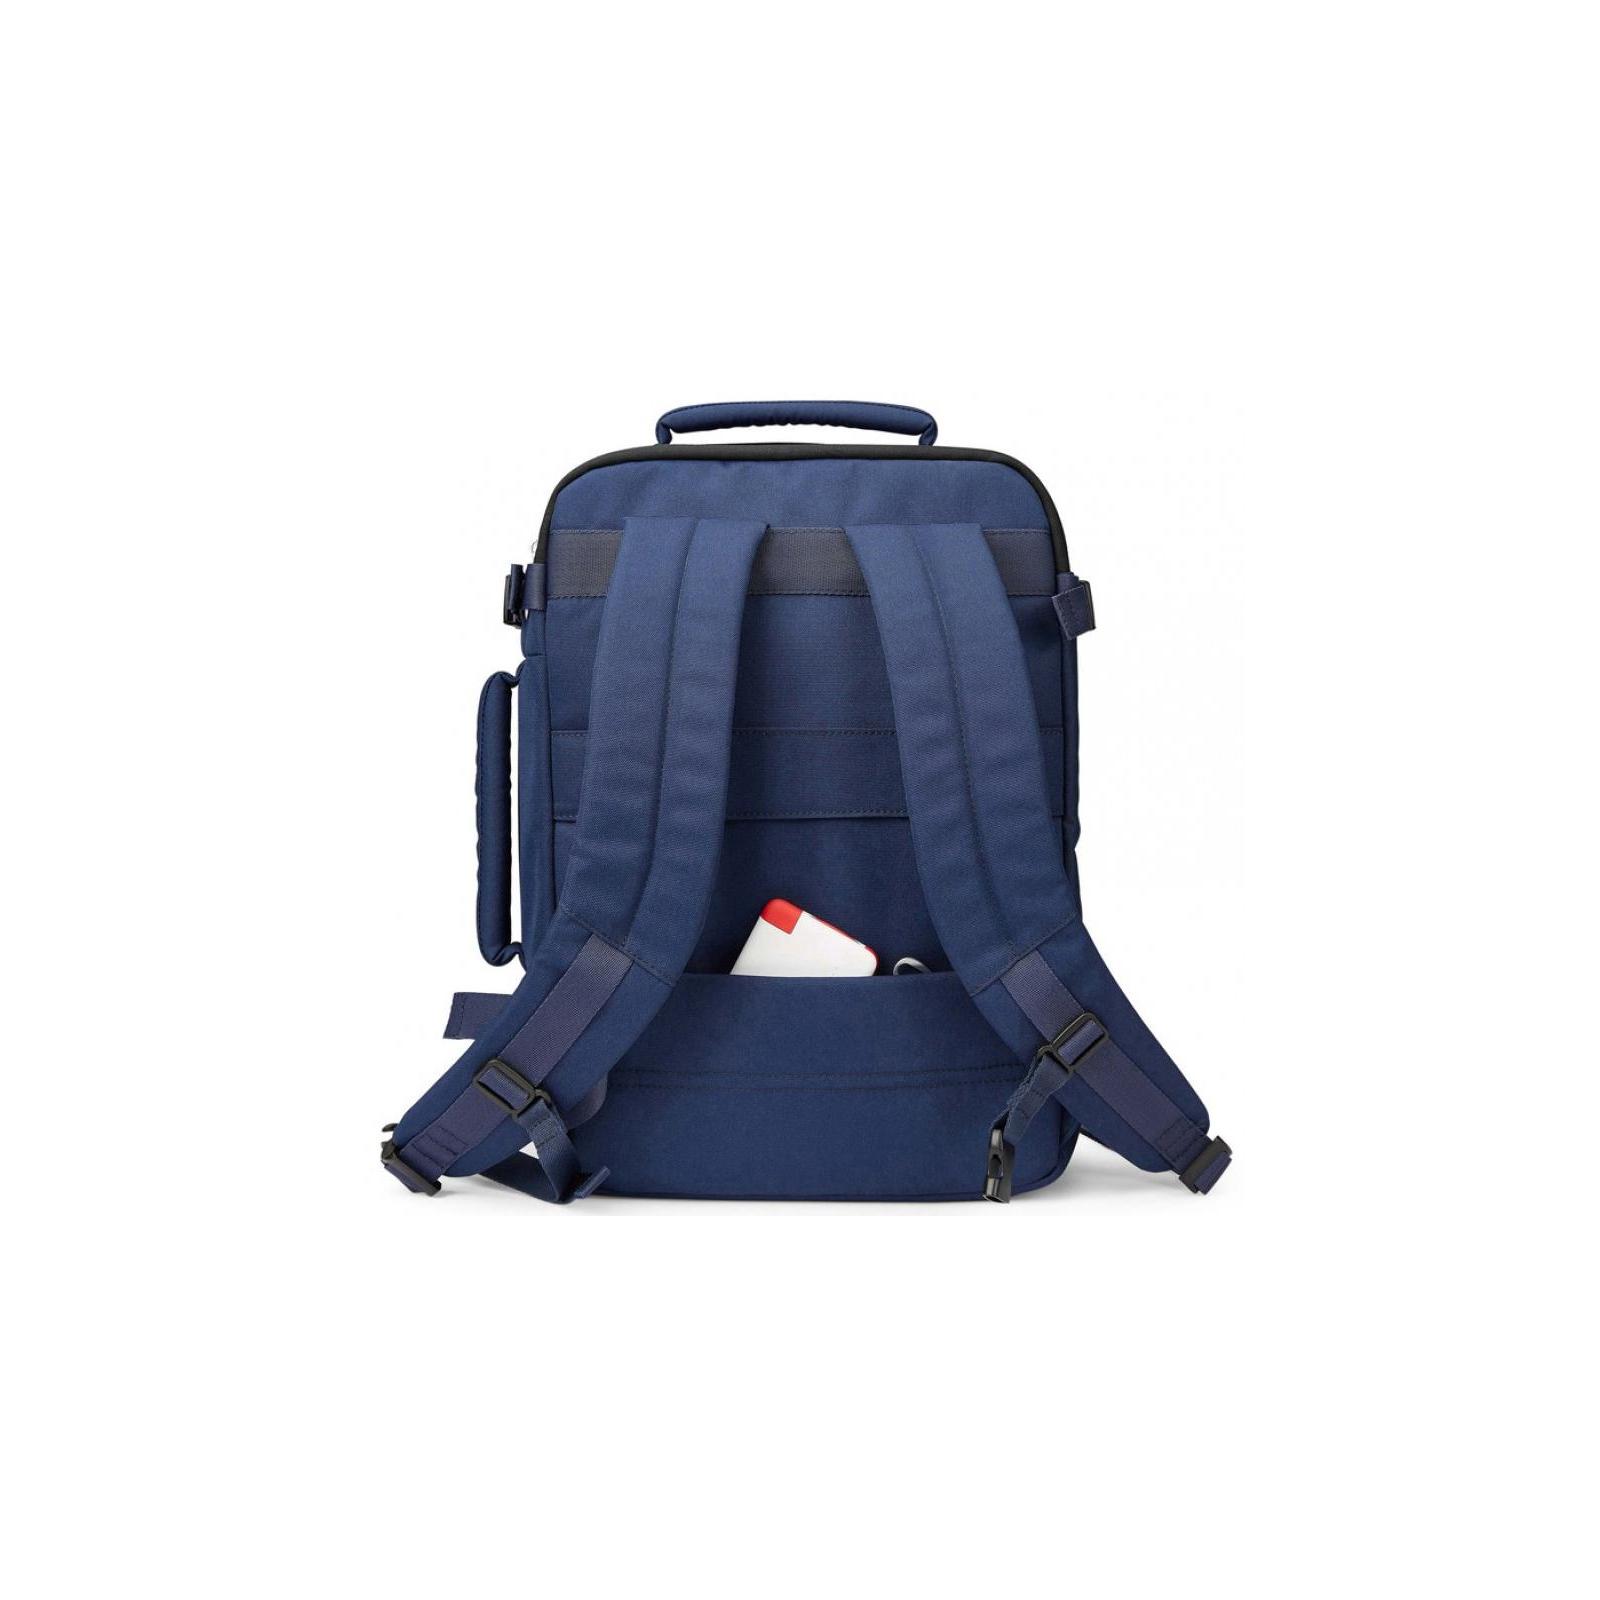 "Рюкзак для ноутбука Tucano 15.6"" TUGO' M CABIN blue (BKTUG-M-B) изображение 3"